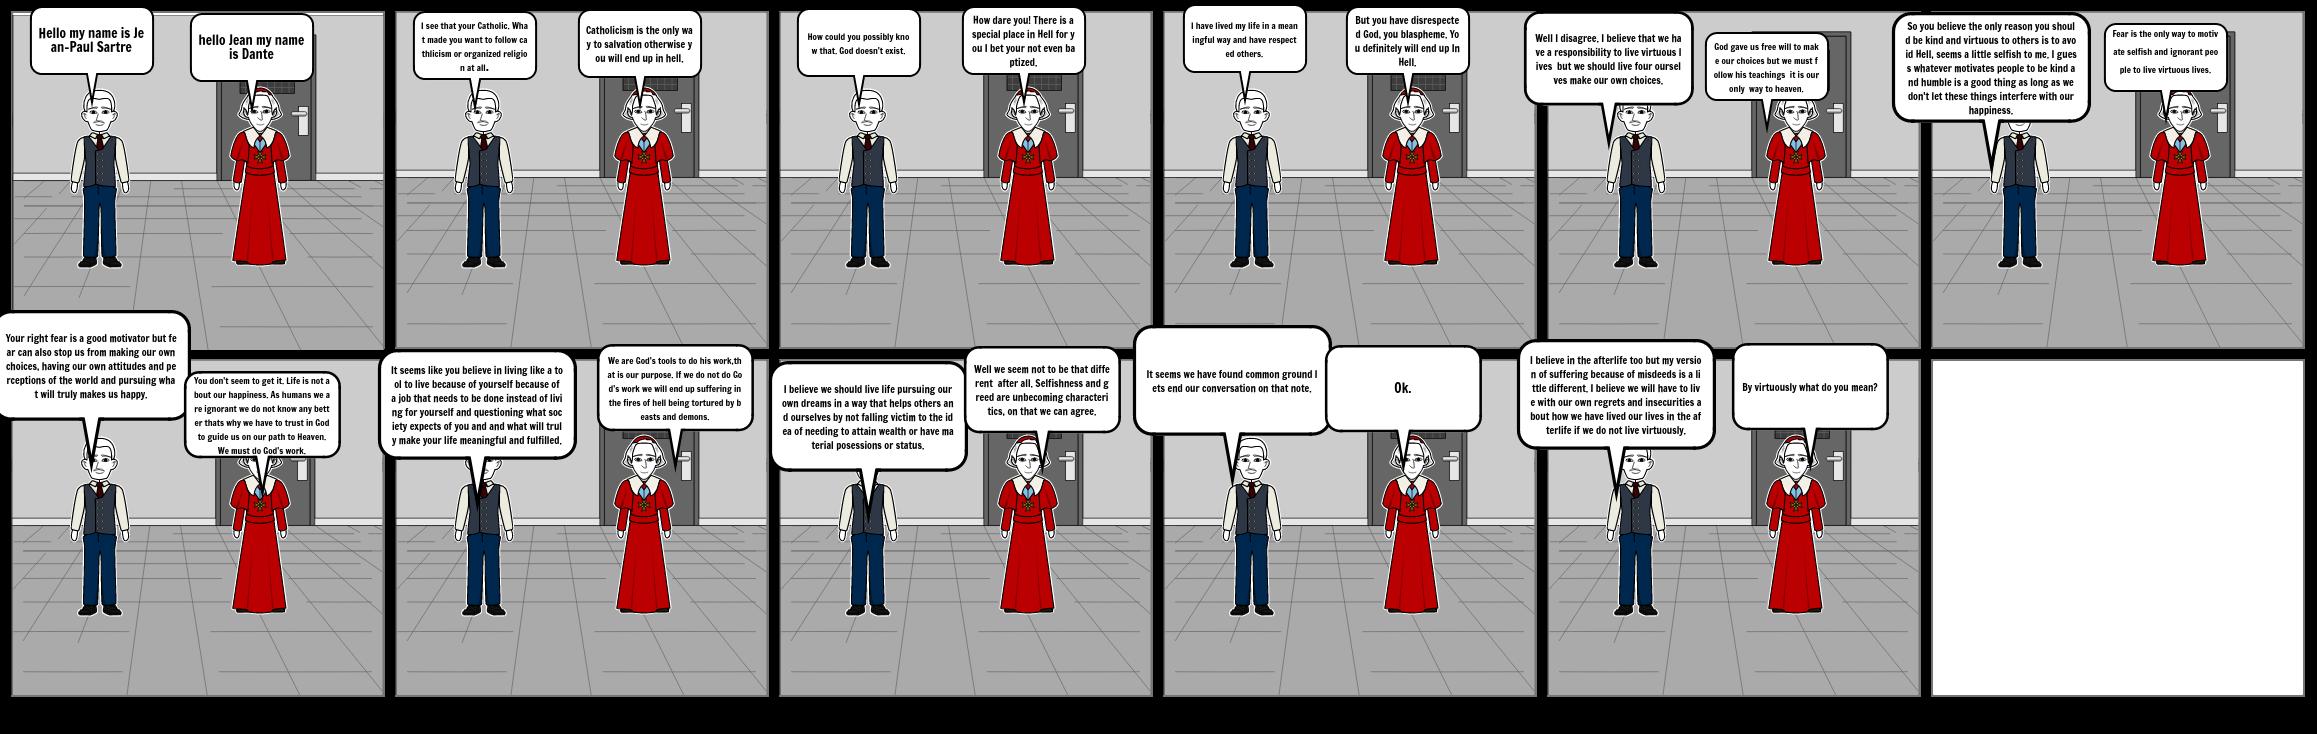 dante's philosophy vs existentialism